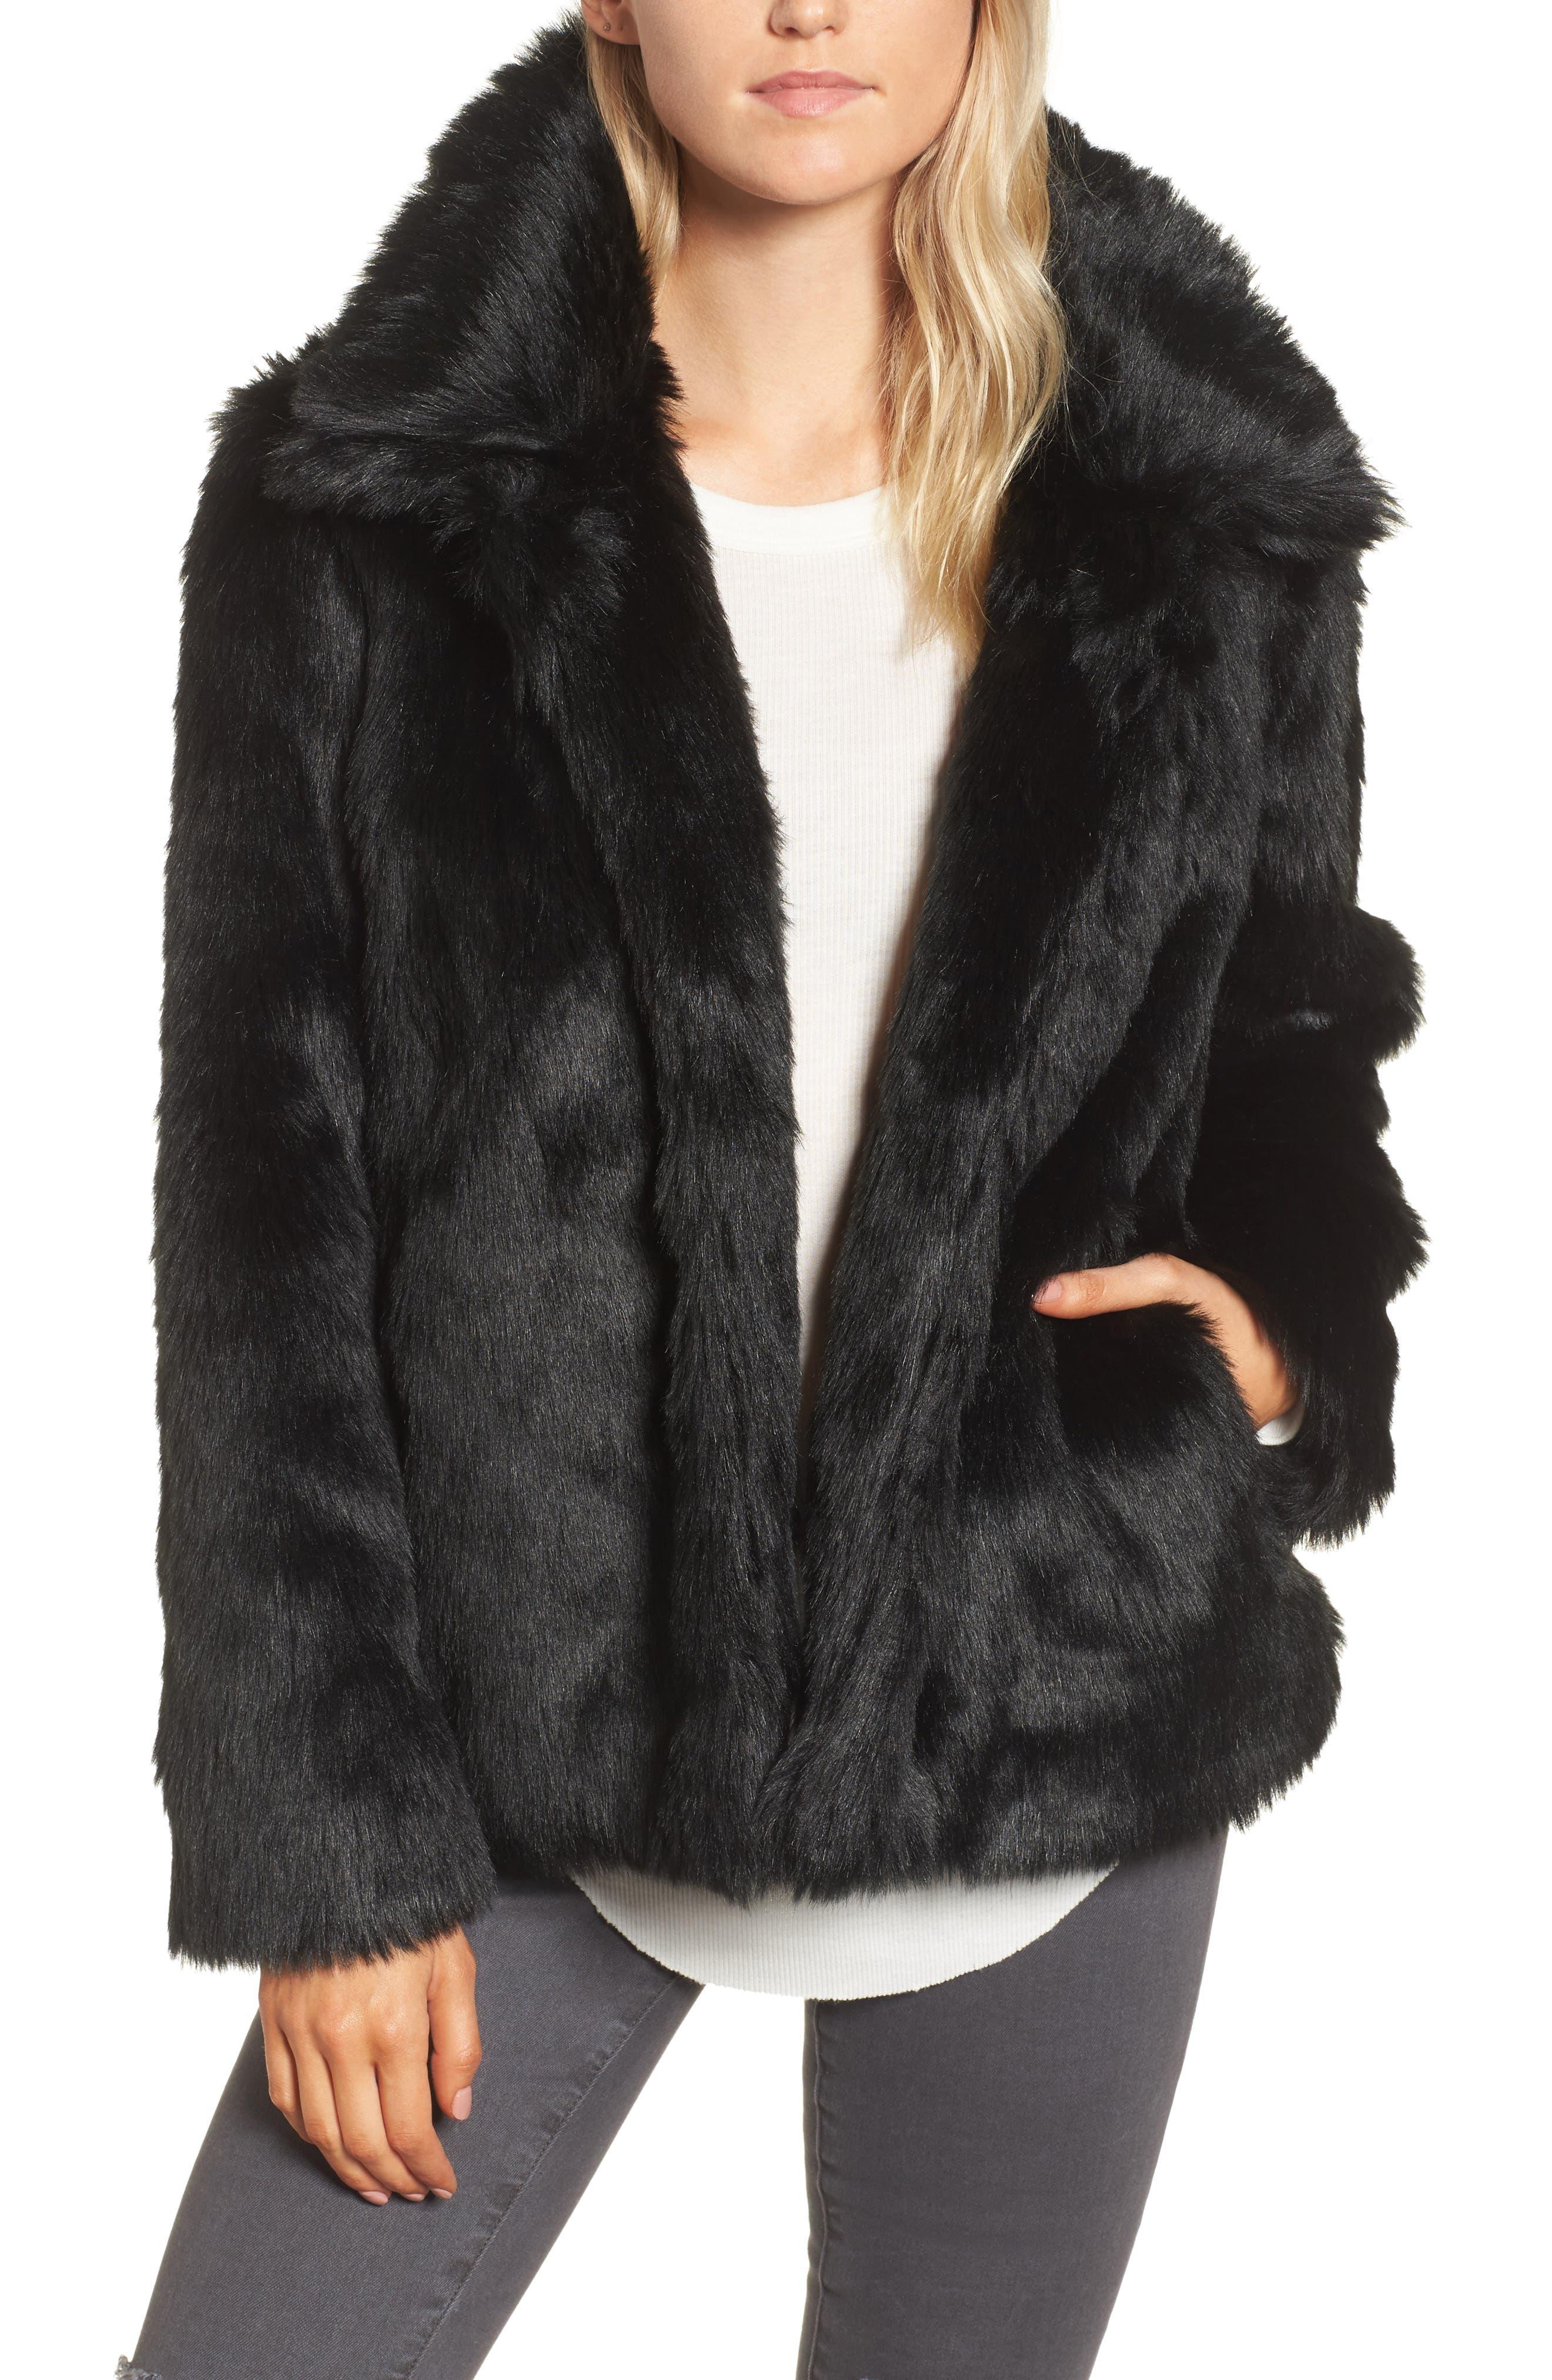 Hinge Faux Fur Jacket